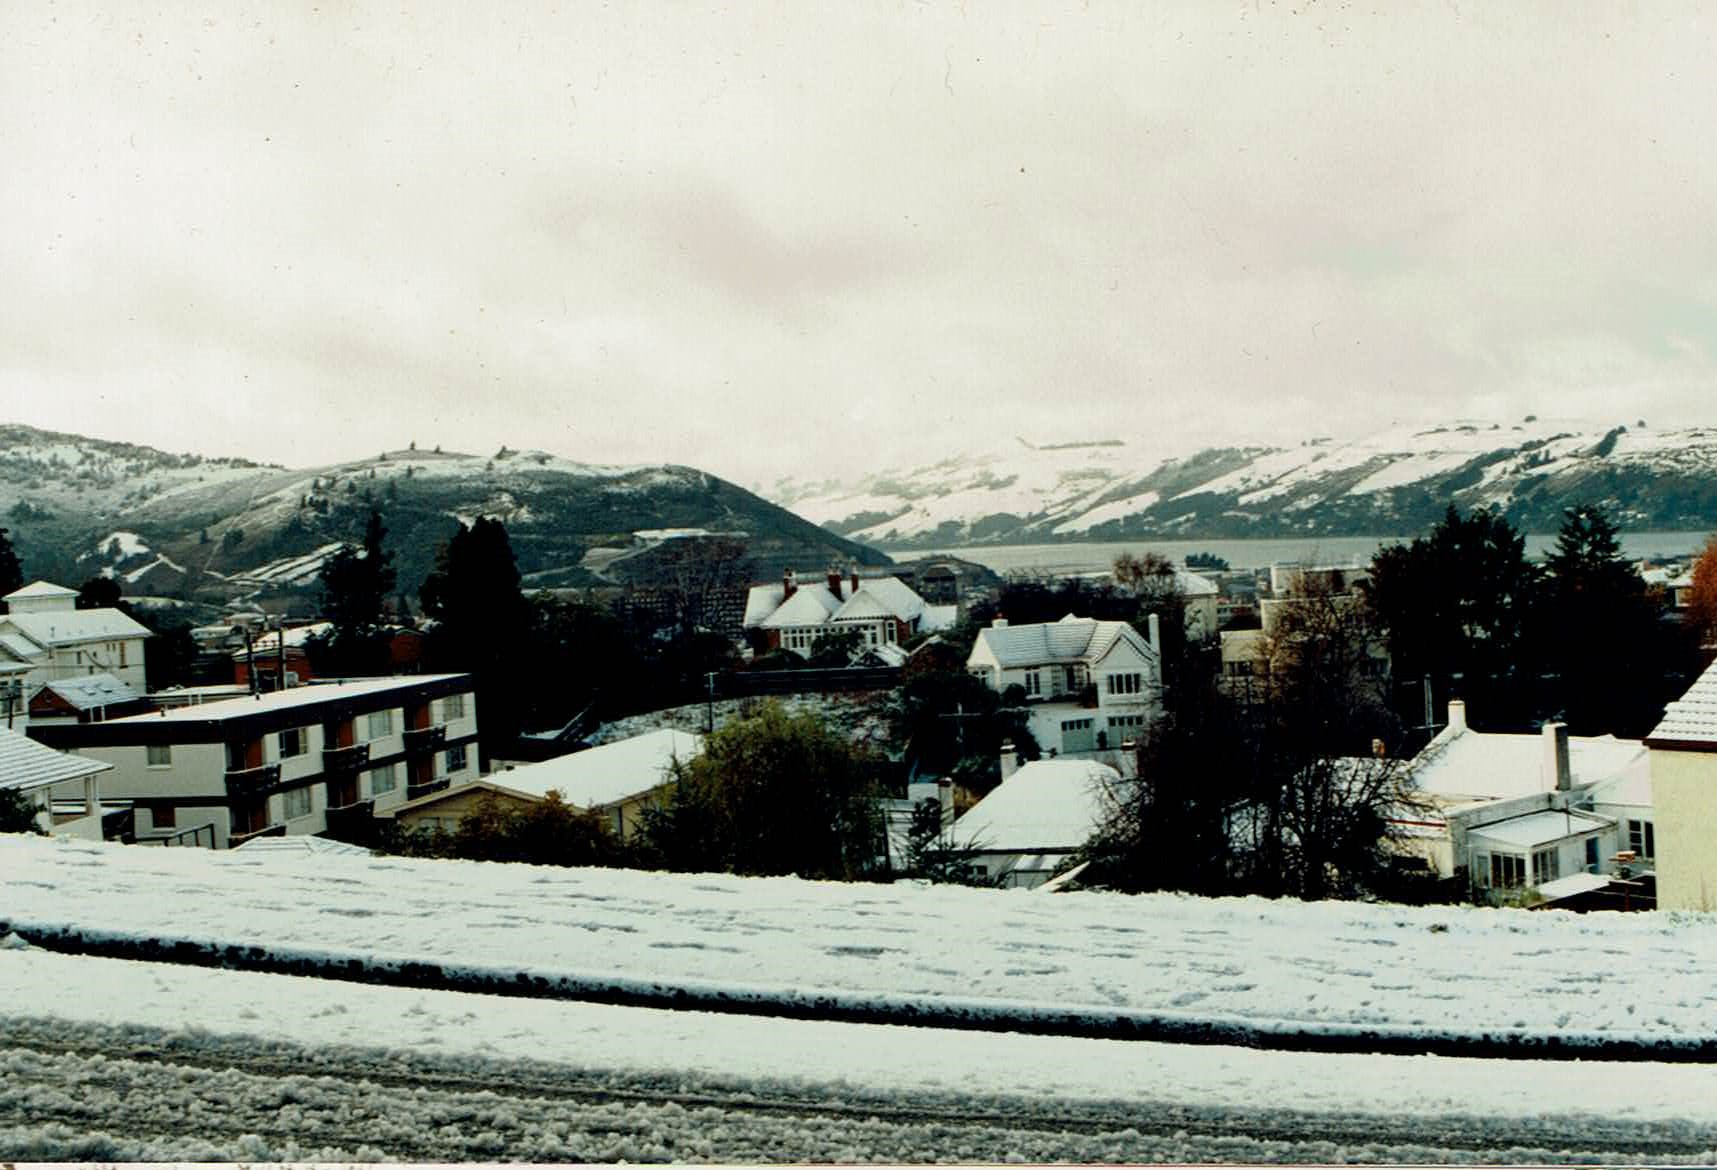 Dunedin in the SNOW!